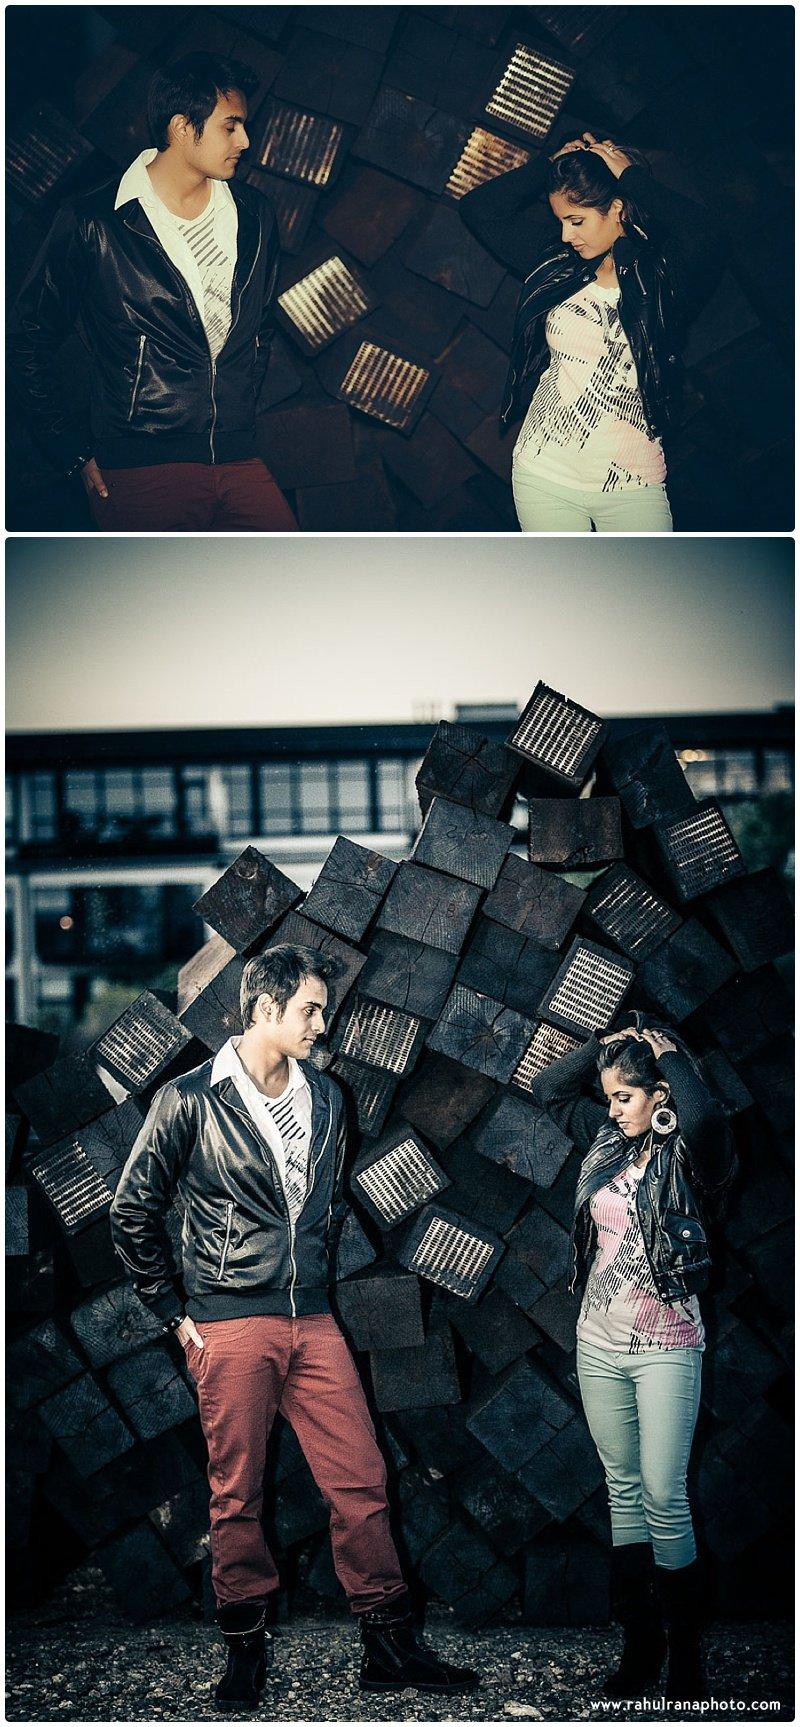 Rina Sunny - wood logs engagement session - Rahul Rana Photography